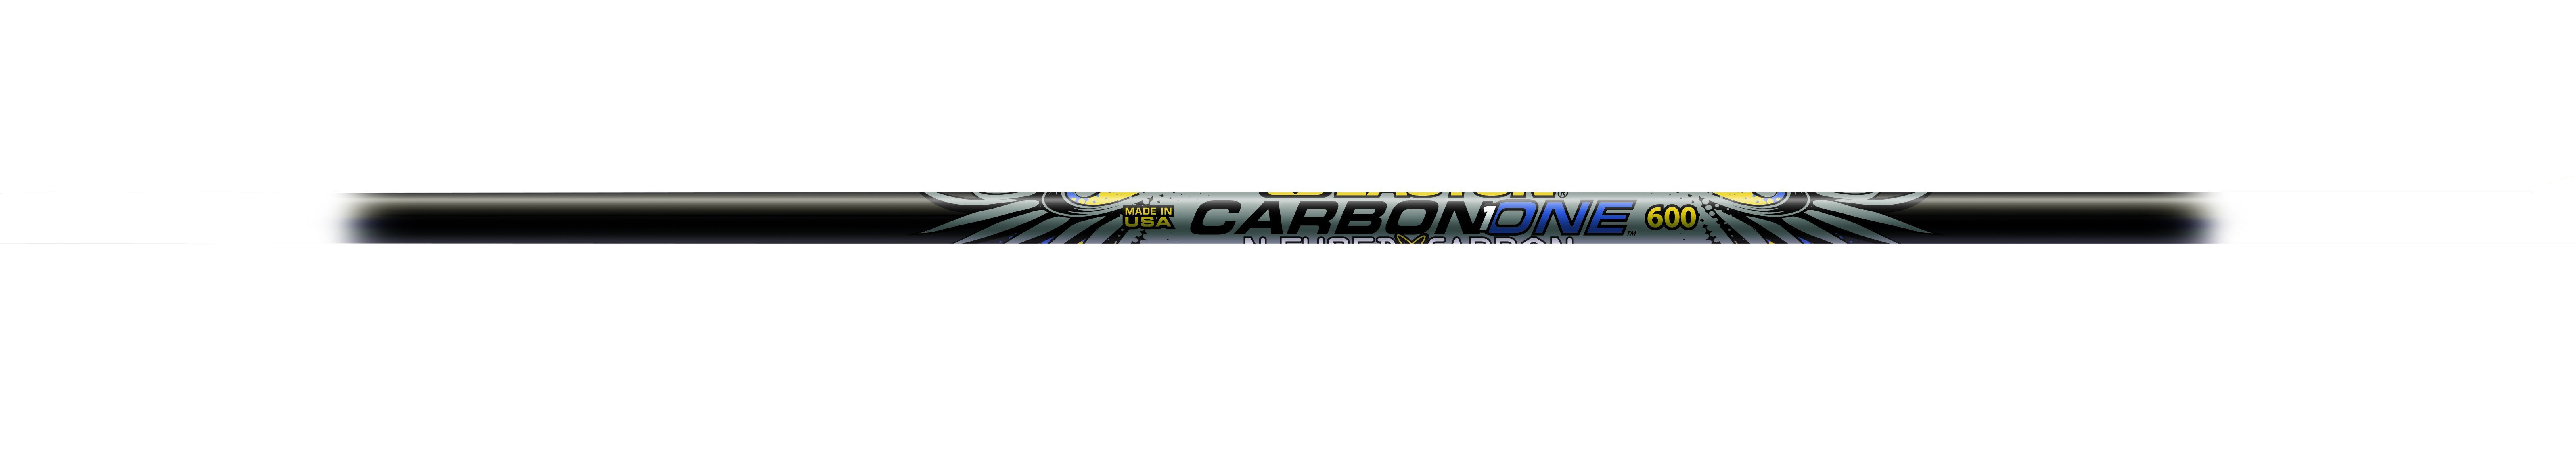 Easton Carbon One Pfeilschaft 550